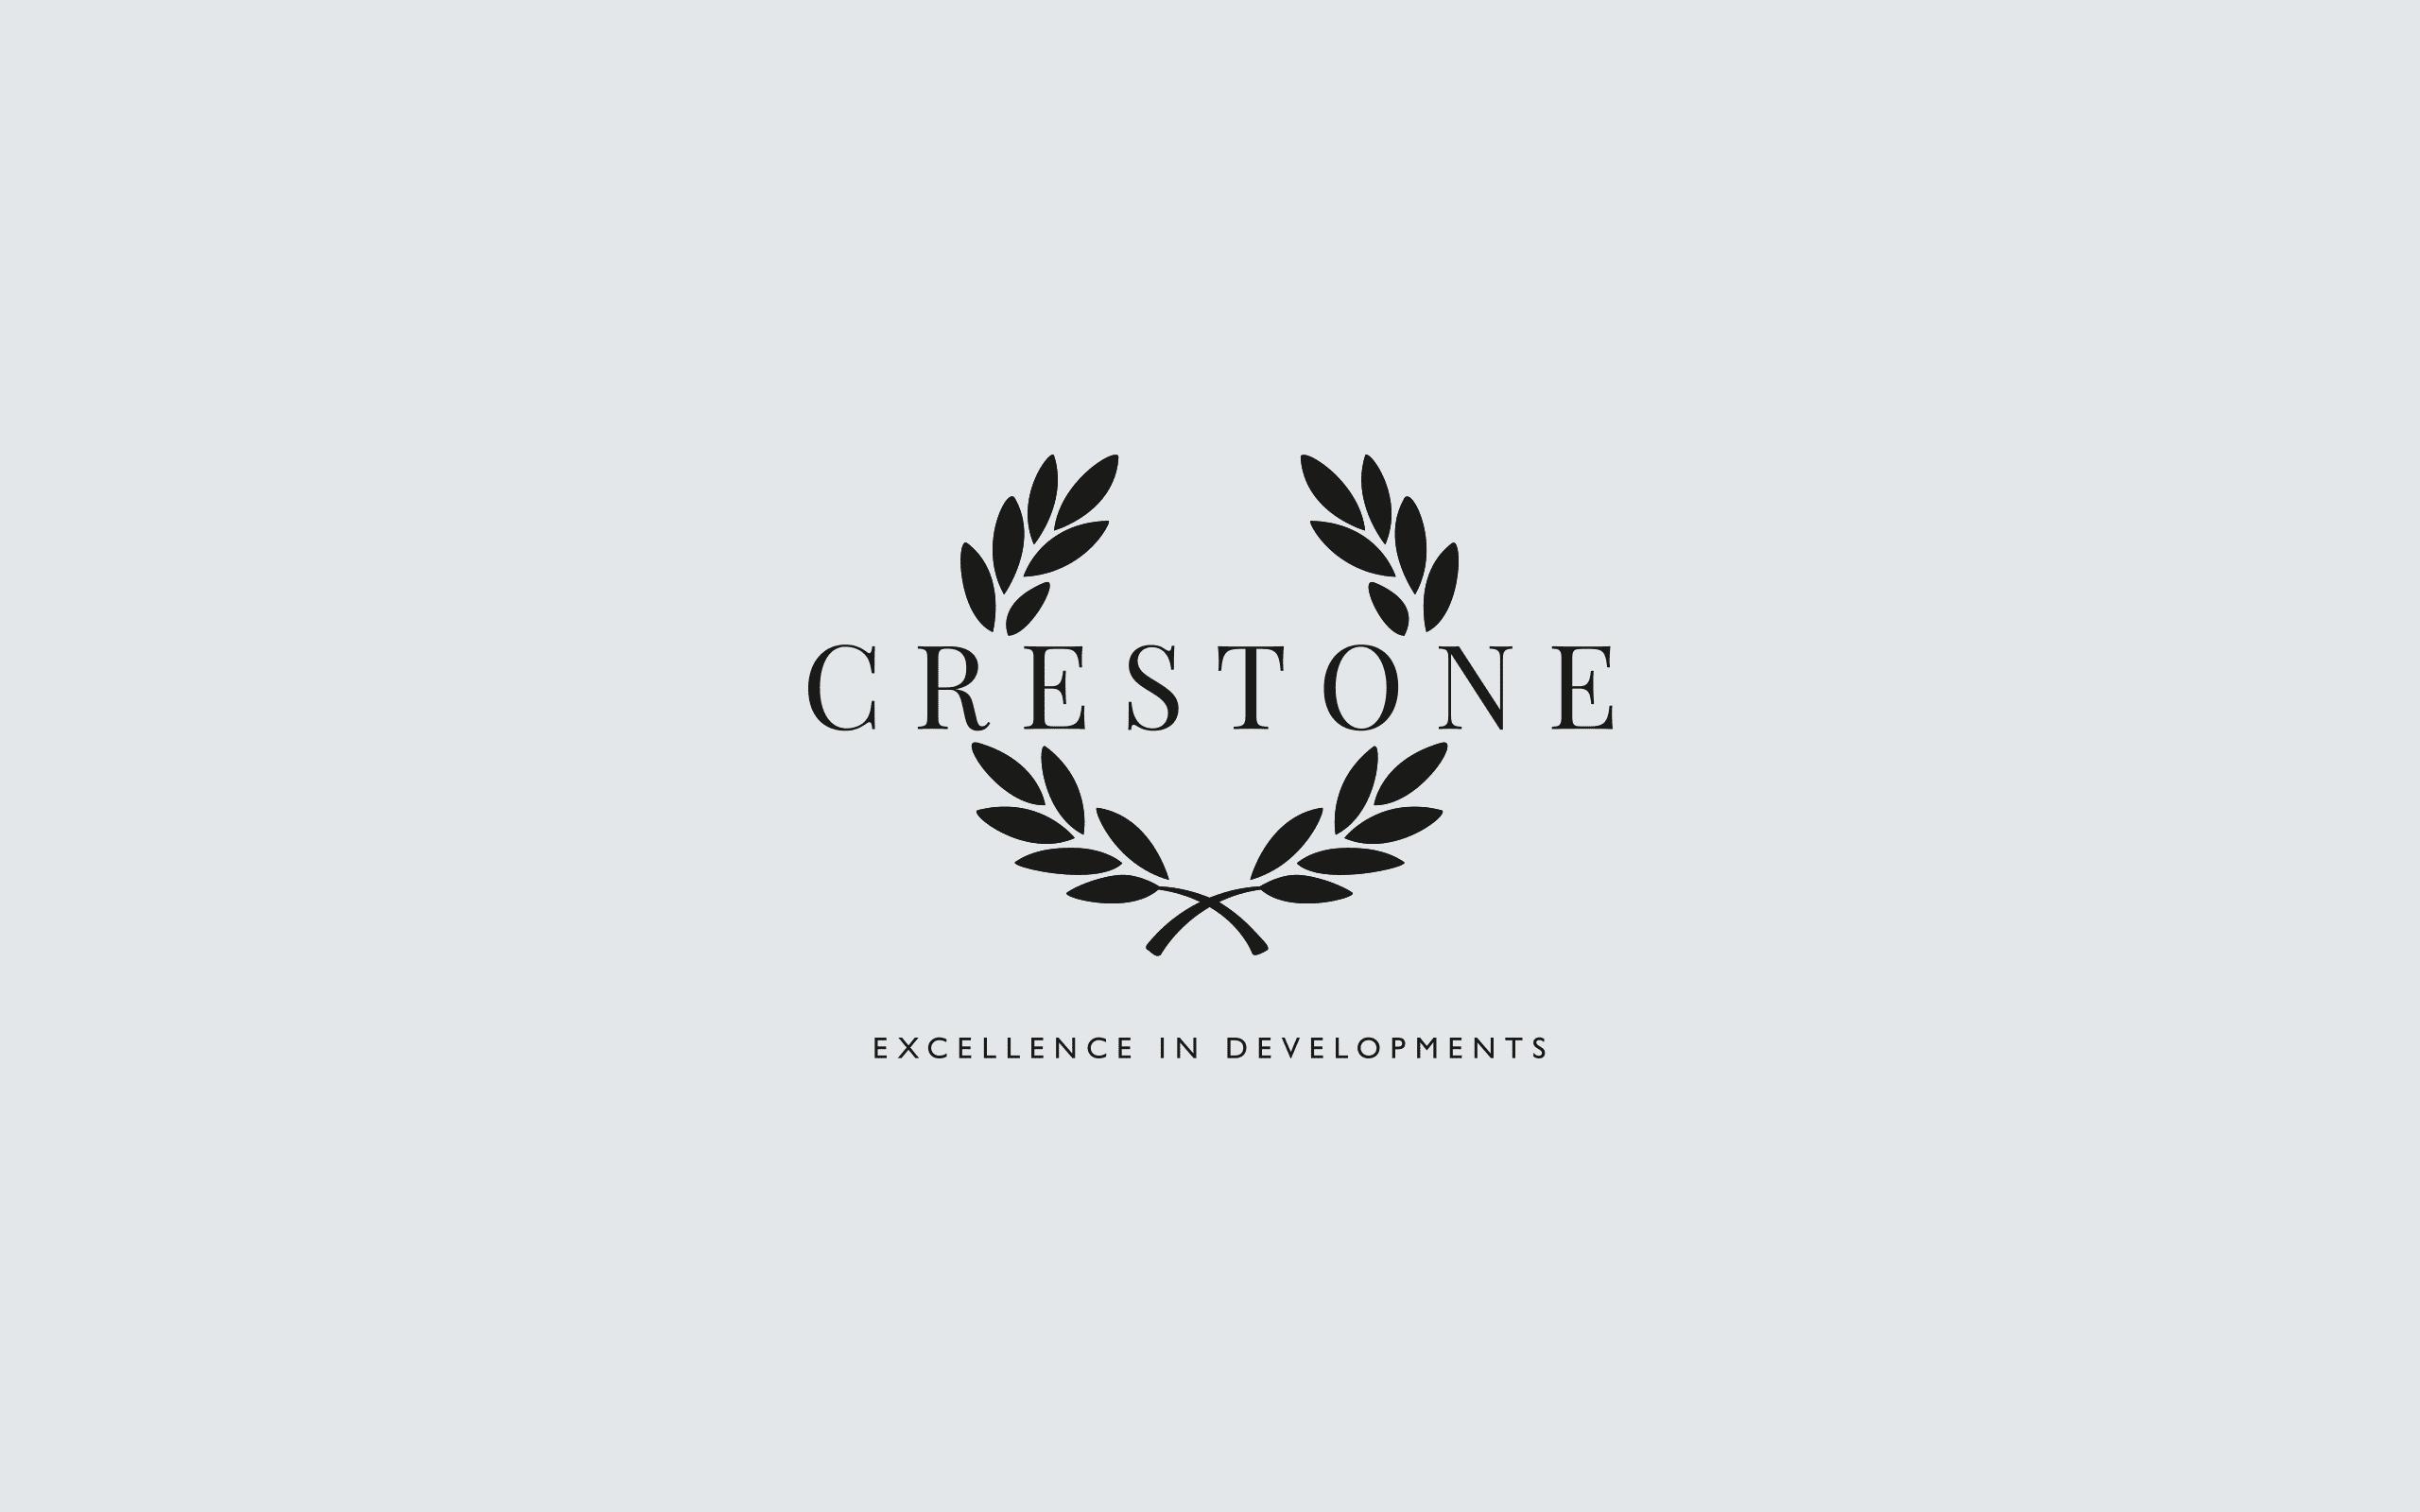 Crestone Developments logotype and new tagline | Zeke Creative